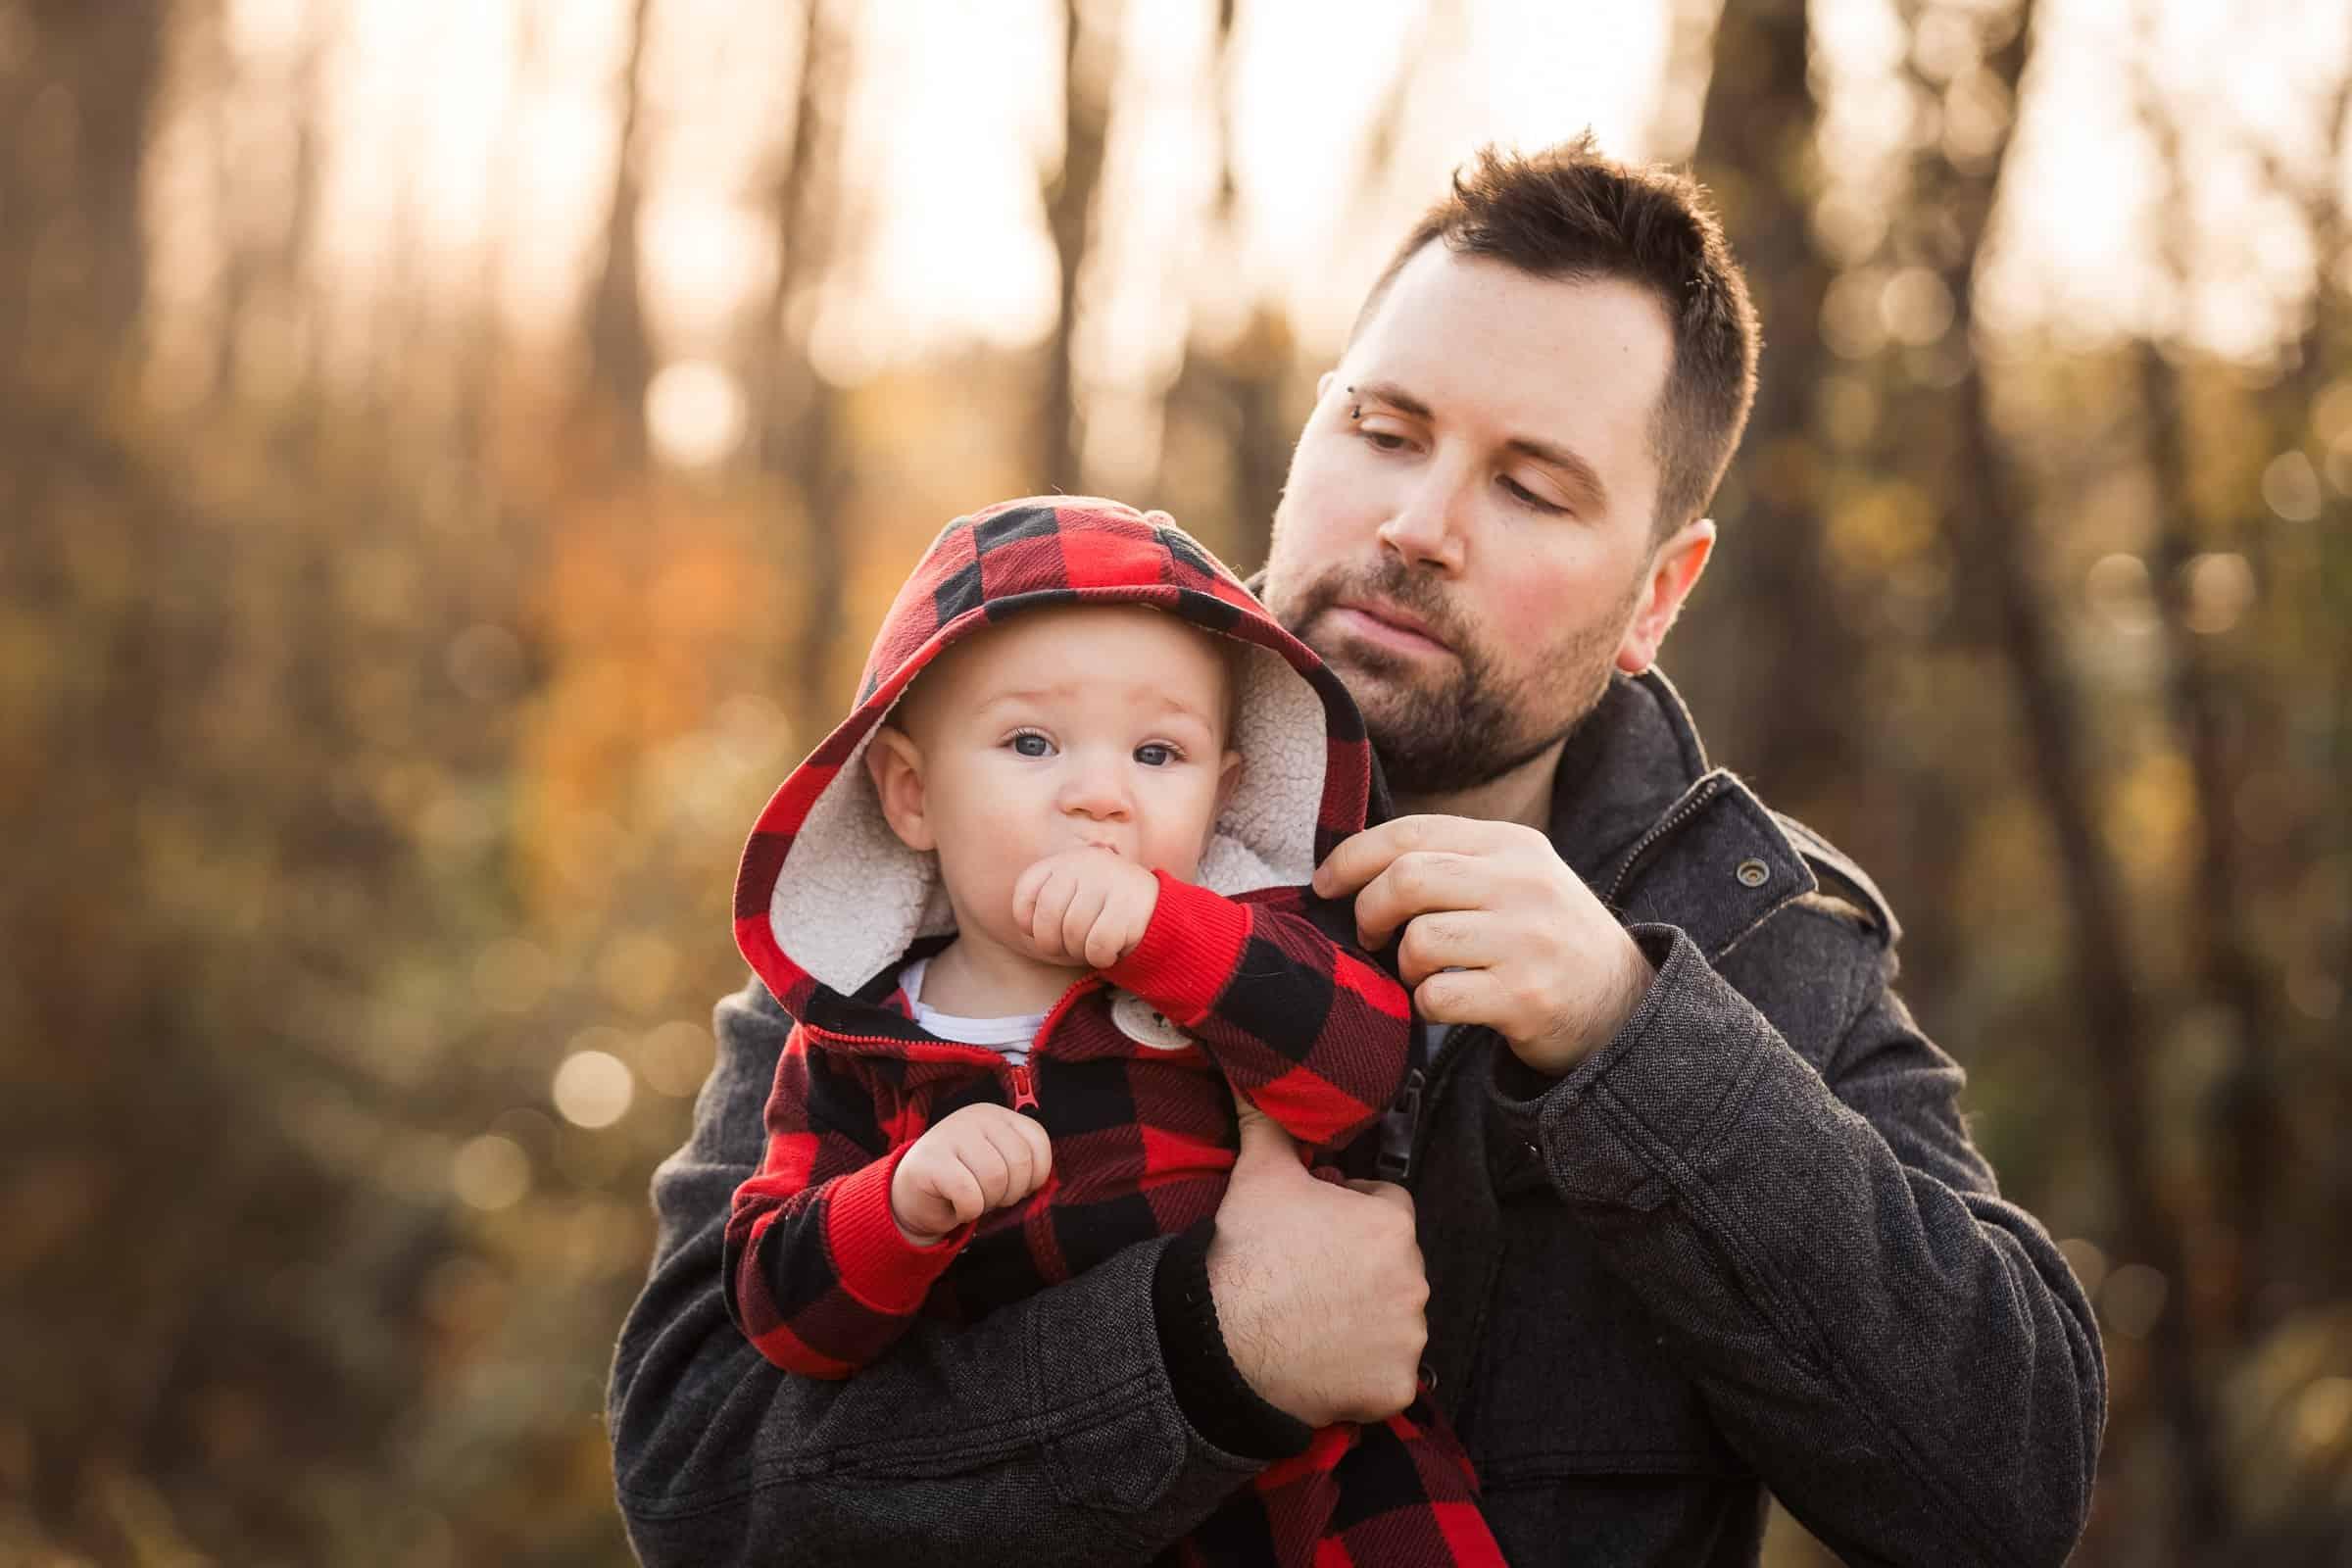 dad holding baby adjusting hood